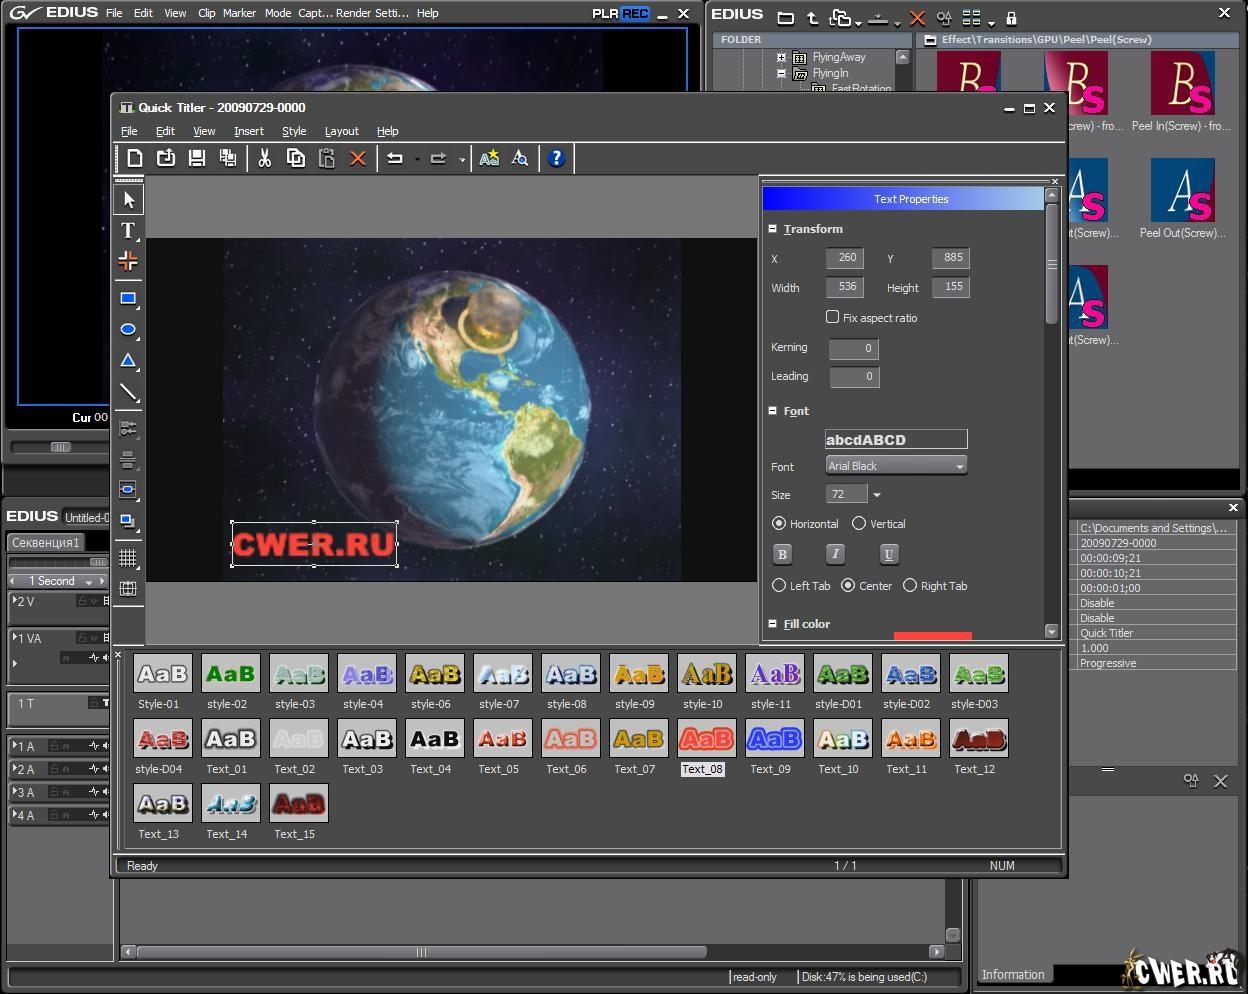 Canopus edius portable free download rar